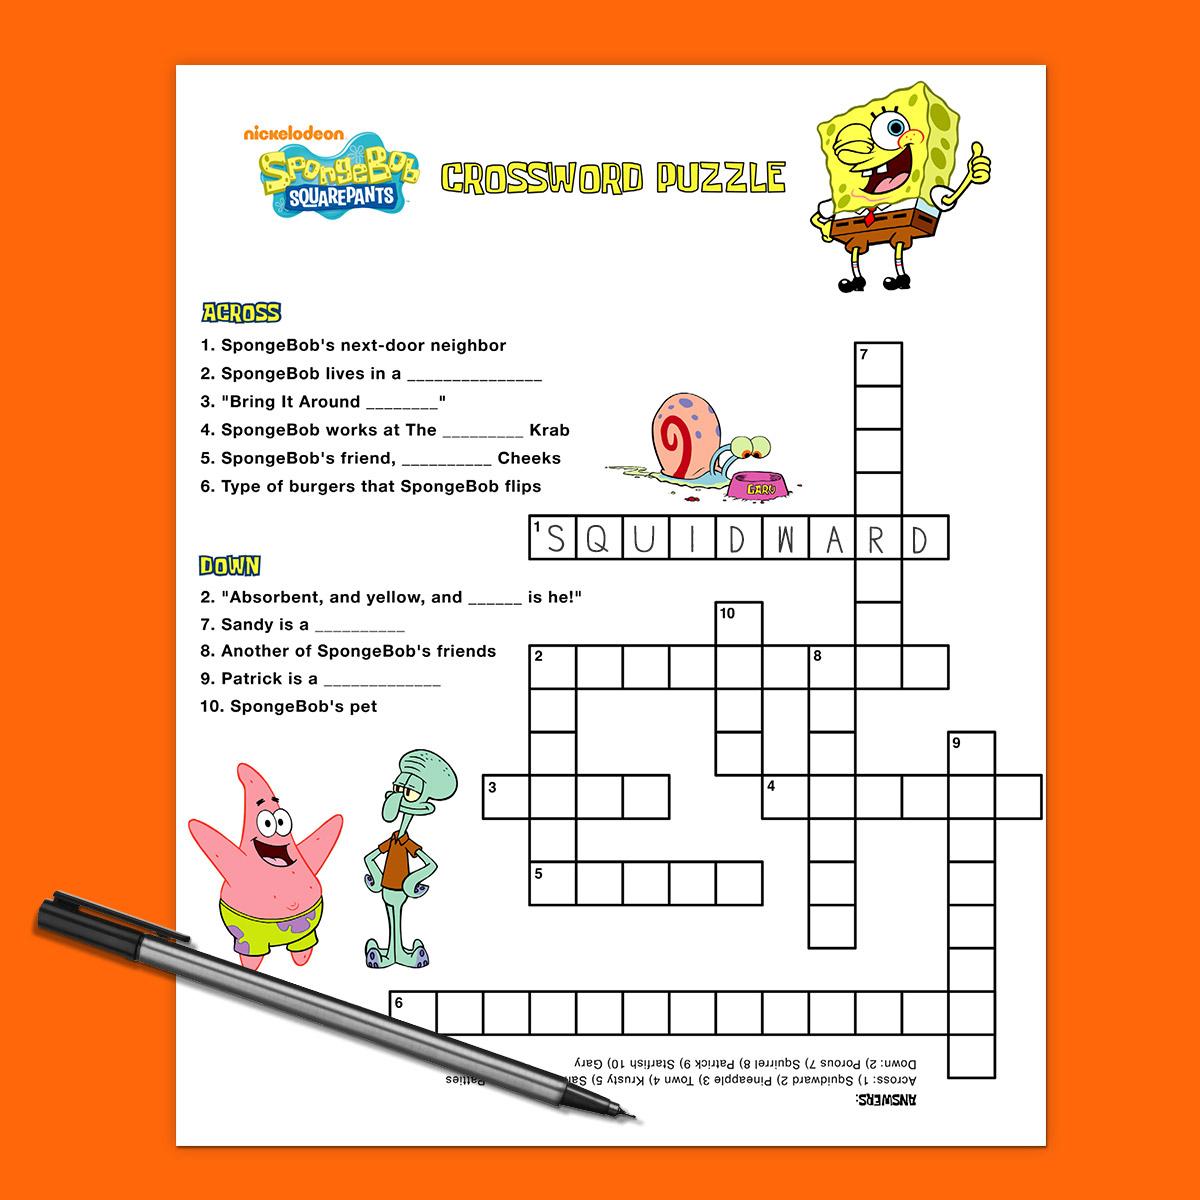 Spongebob Crossword Puzzle | Nickelodeon Parents - Printable Teenage Crossword Puzzles